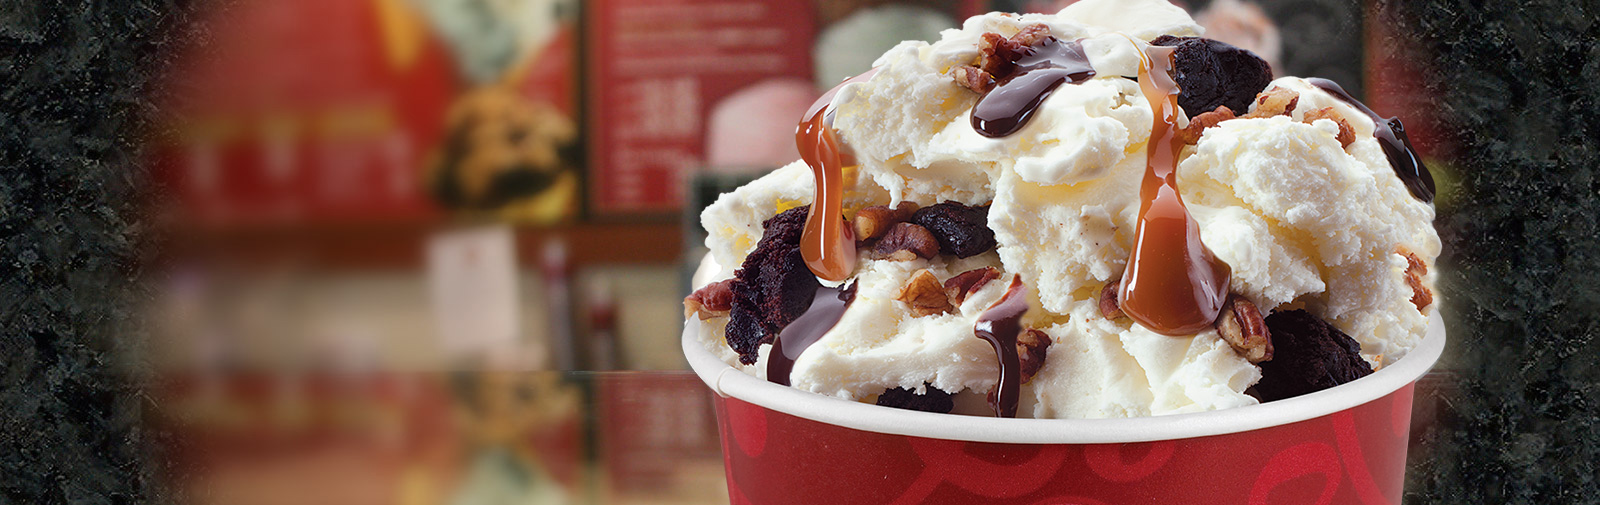 Cold Stone Creamery Signature Creations Ice Cream